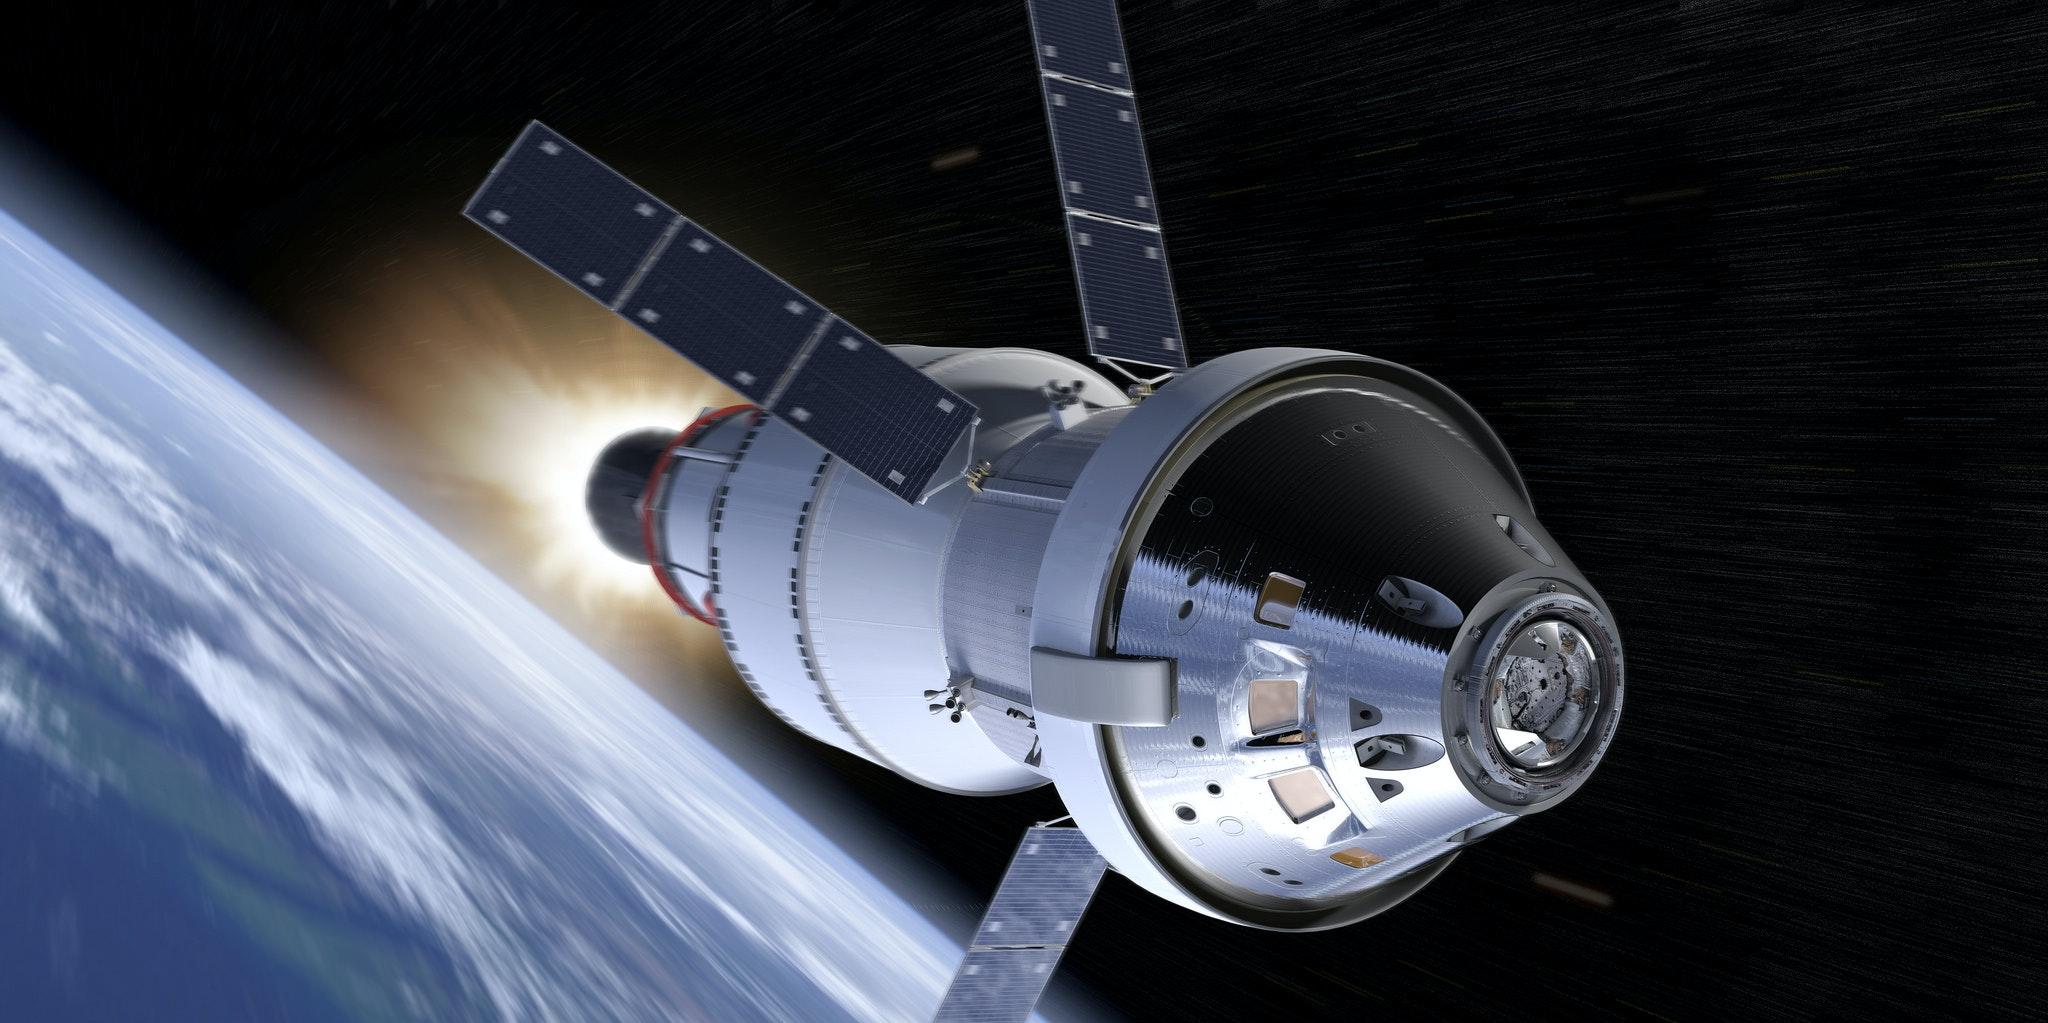 NASA Nixes Plans to Send Astronauts to Lunar Orbit in 2019